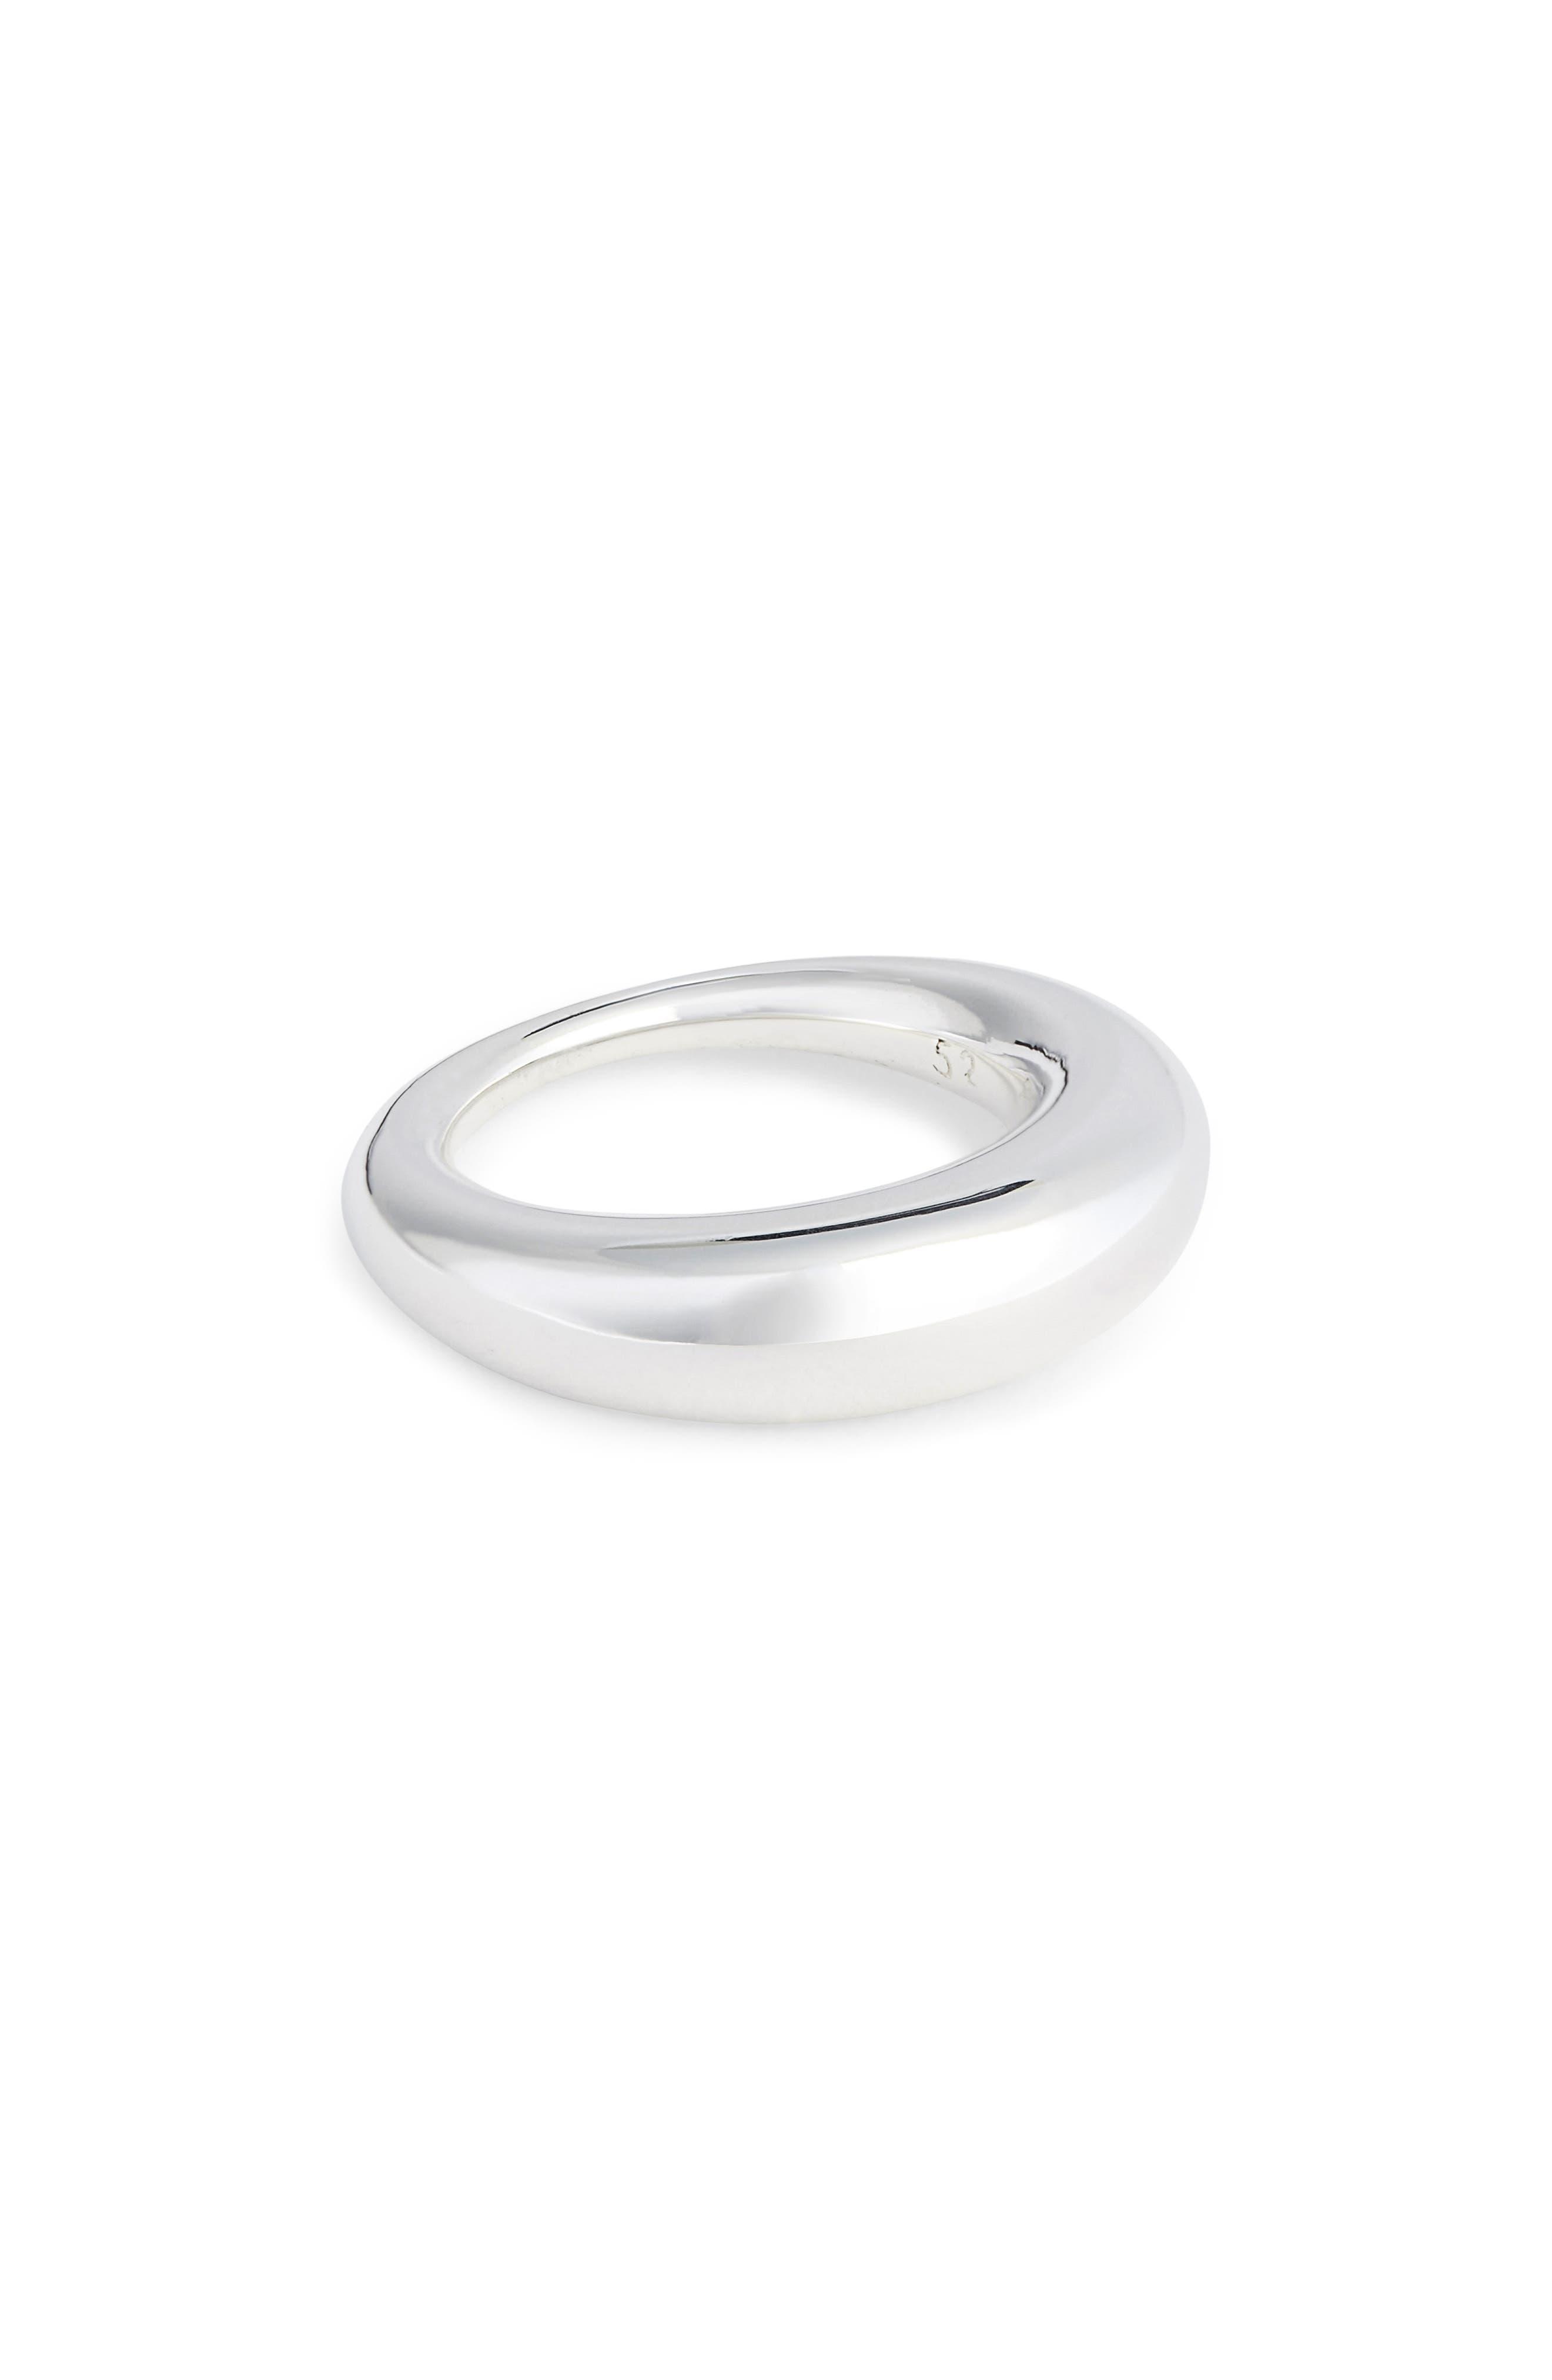 Large Snake Polished Silver Ring,                         Main,                         color, POLISHED SILVER